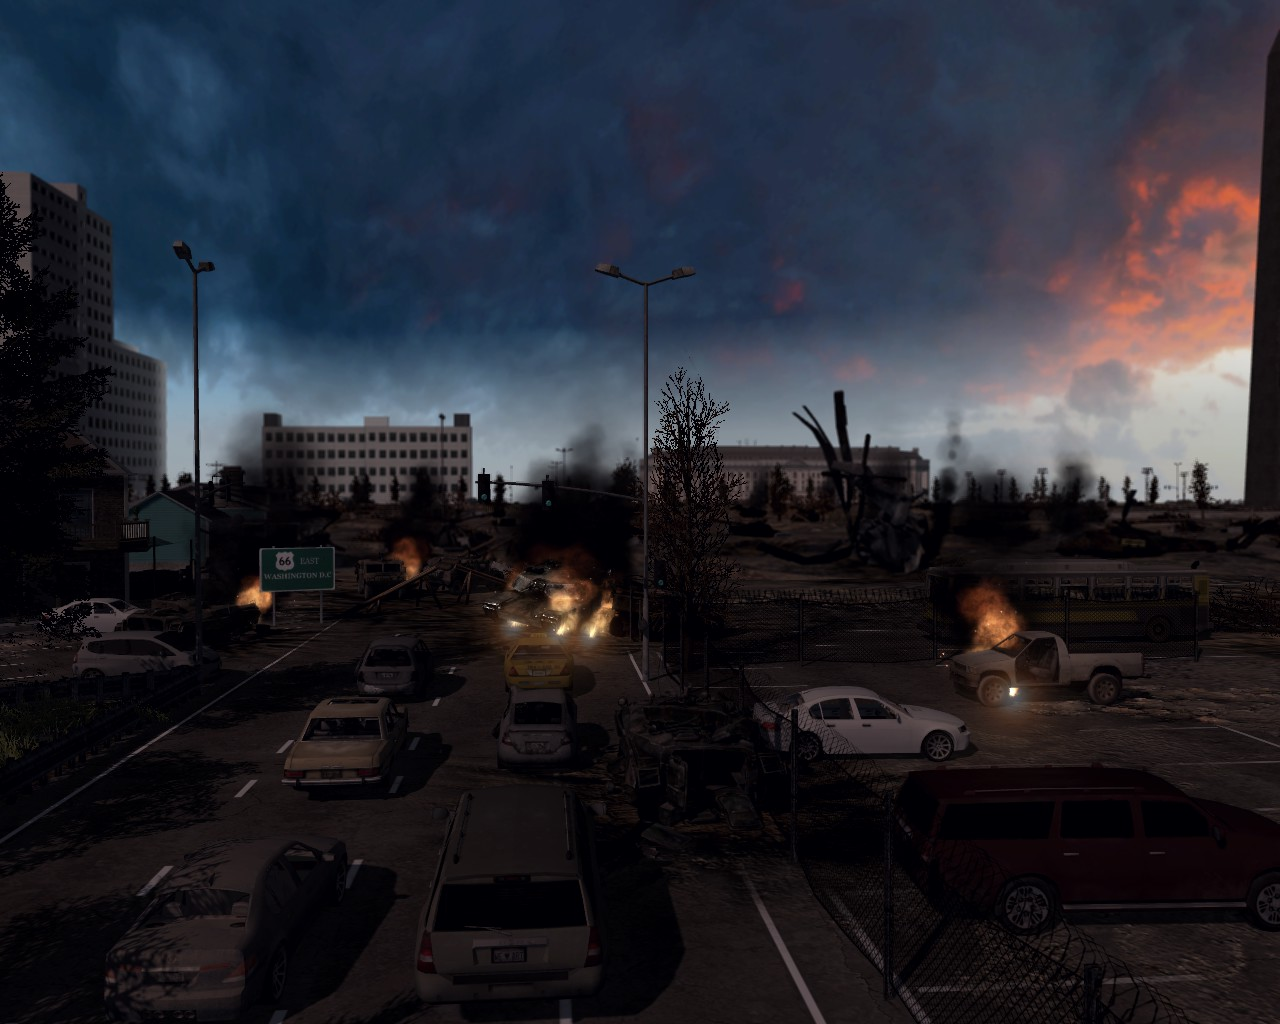 Скачать Call of Duty WW3 v1.31.000 — Beta (AS2 — 3.205.2) — бесплатно